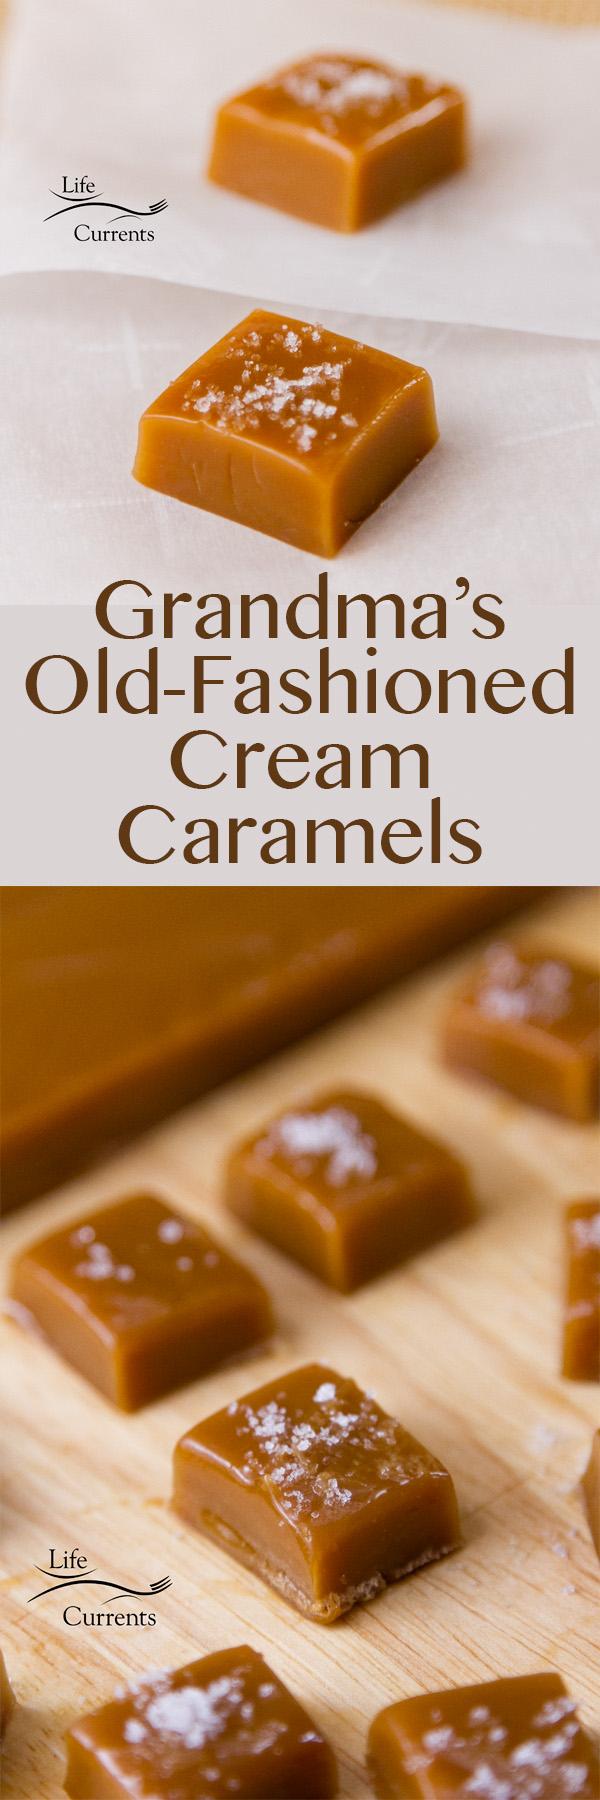 Grandma's Old-fashioned Cream Caramels